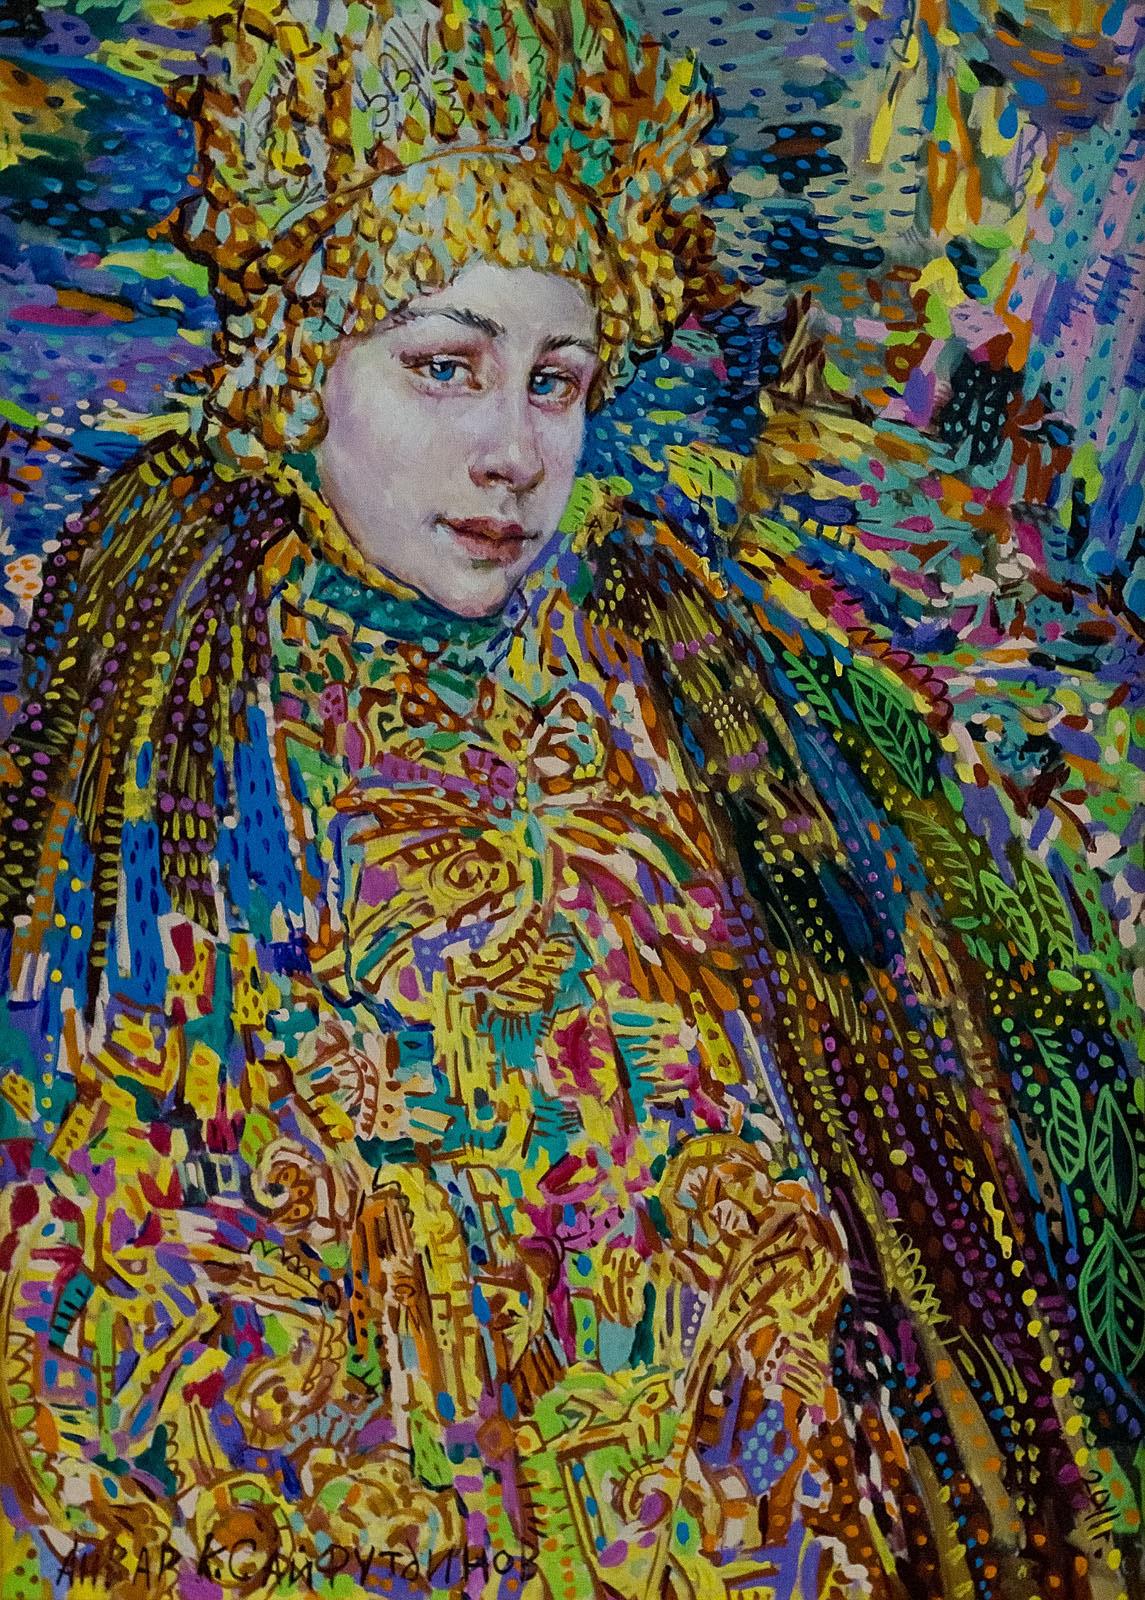 Фото №150677. Татарская невеста. А.Сайфутдинов